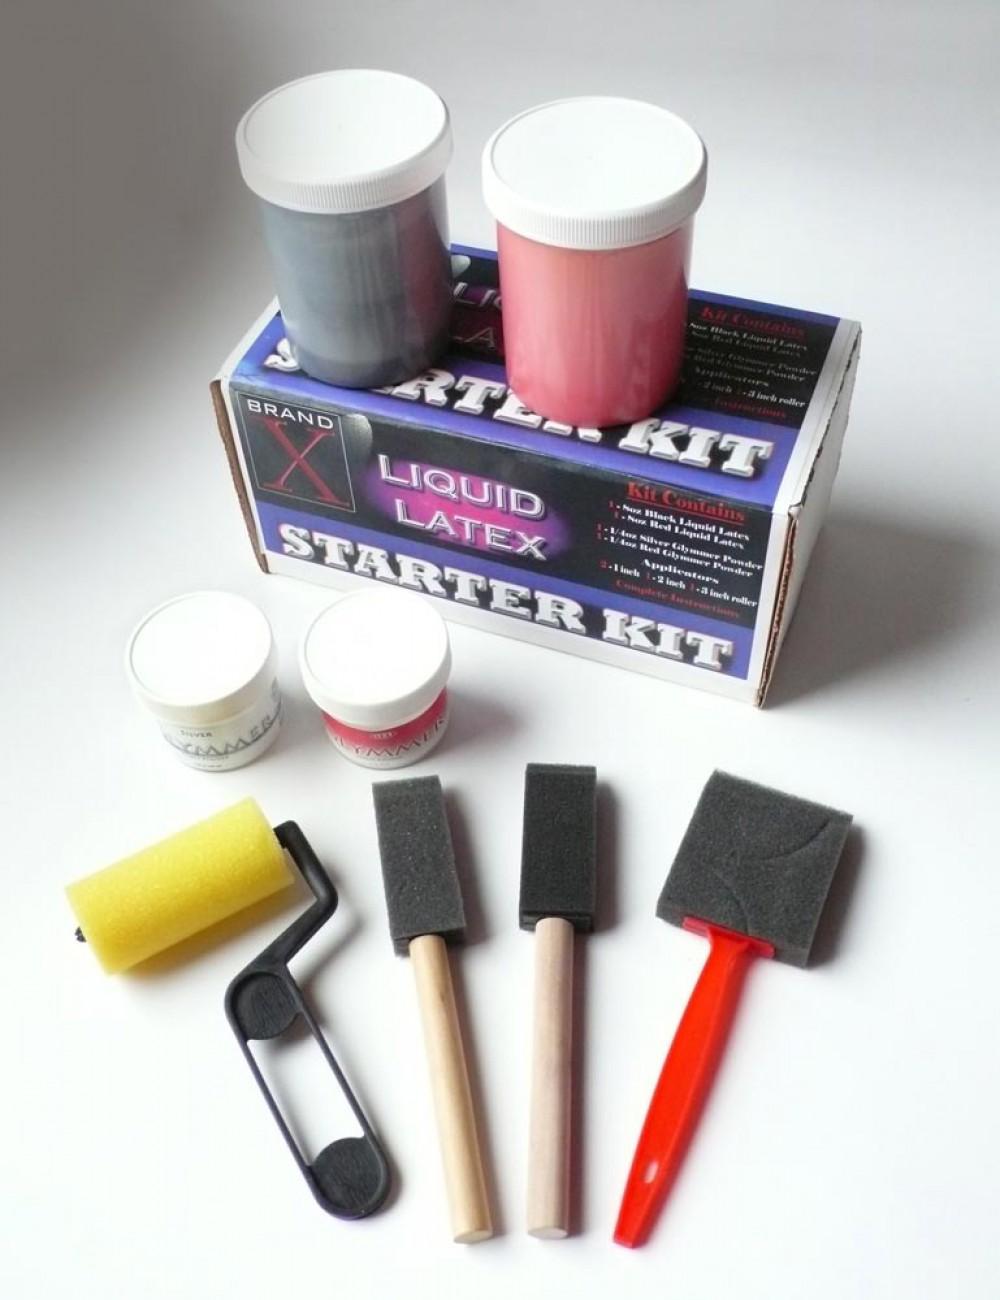 Liquid Latex Starter Kit